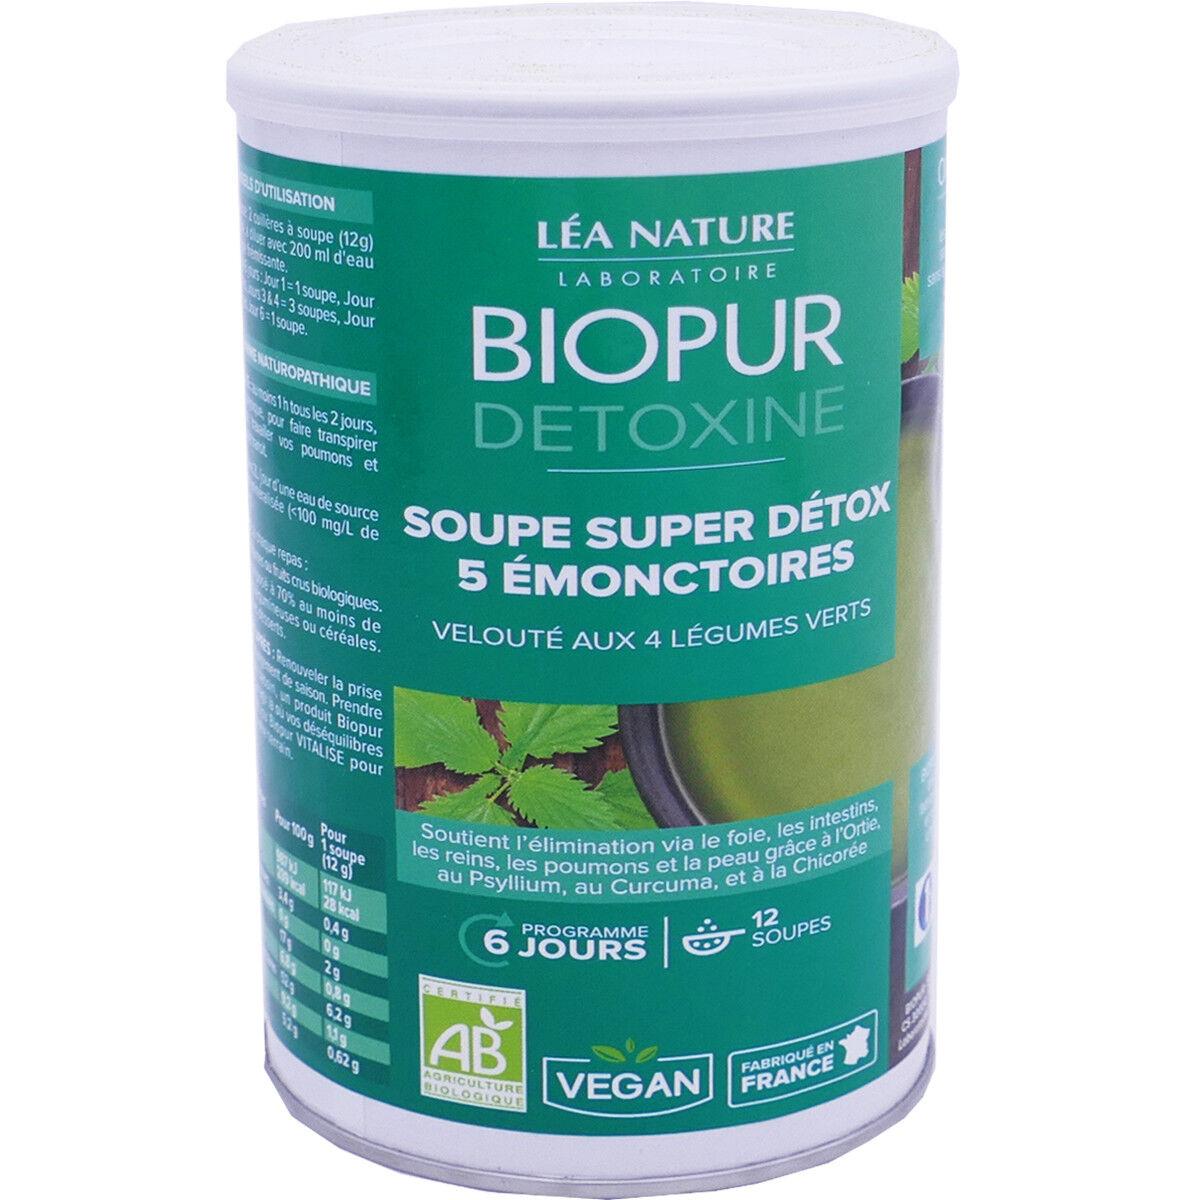 LEA NATURE Biopur detoxine 12 soupes super detox 5 emonctoires 150g bio